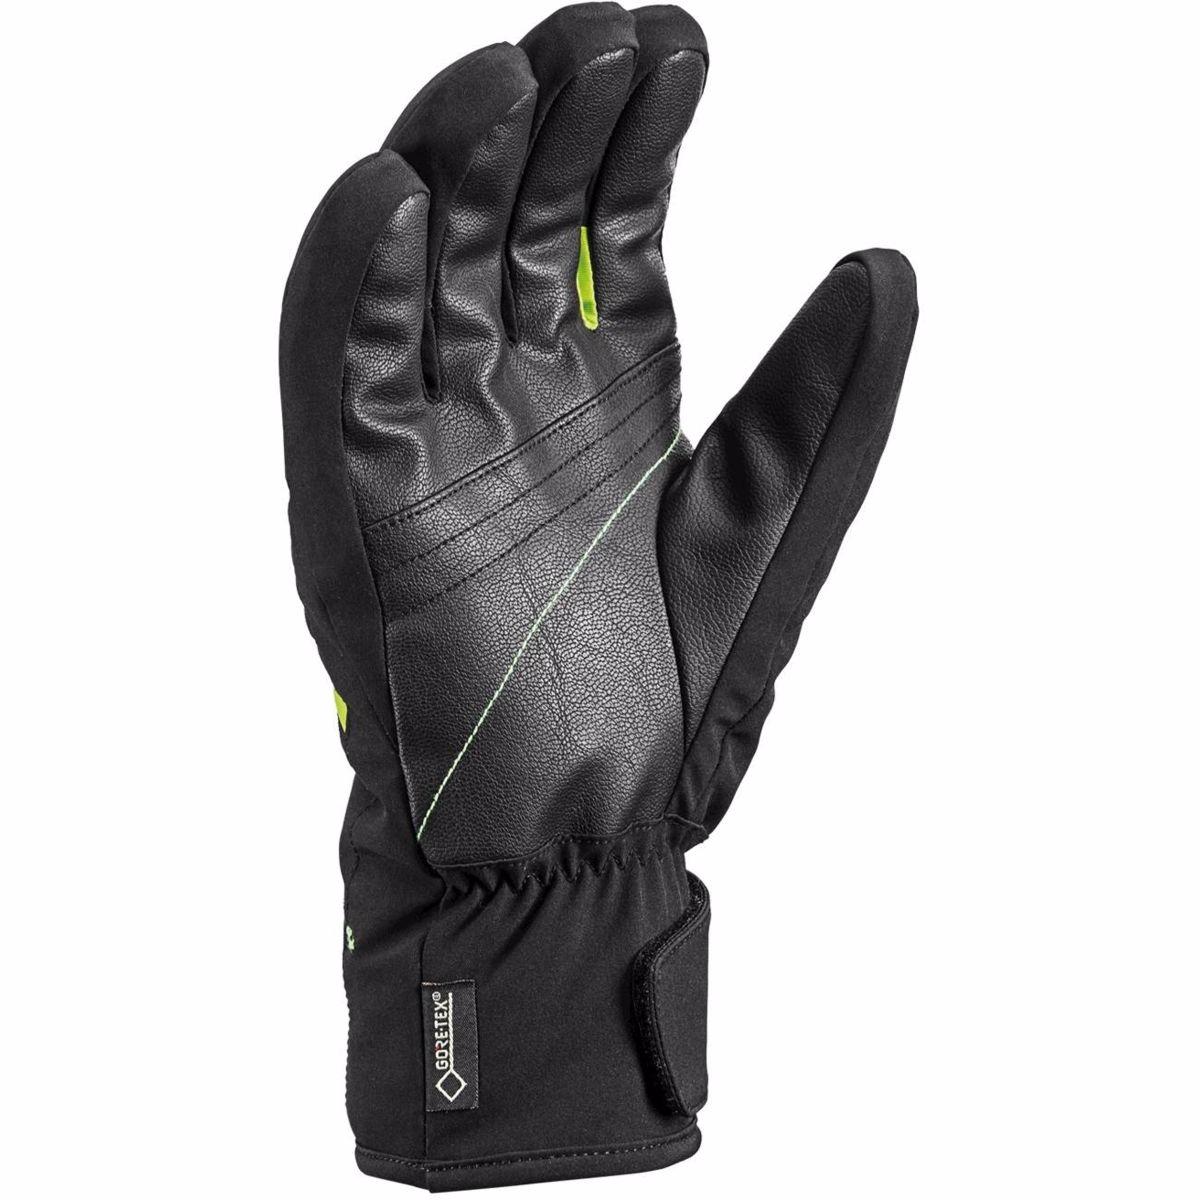 Lyžiarske rukavice LEKI SPACE GTX Black Lime  00dee54e0c0